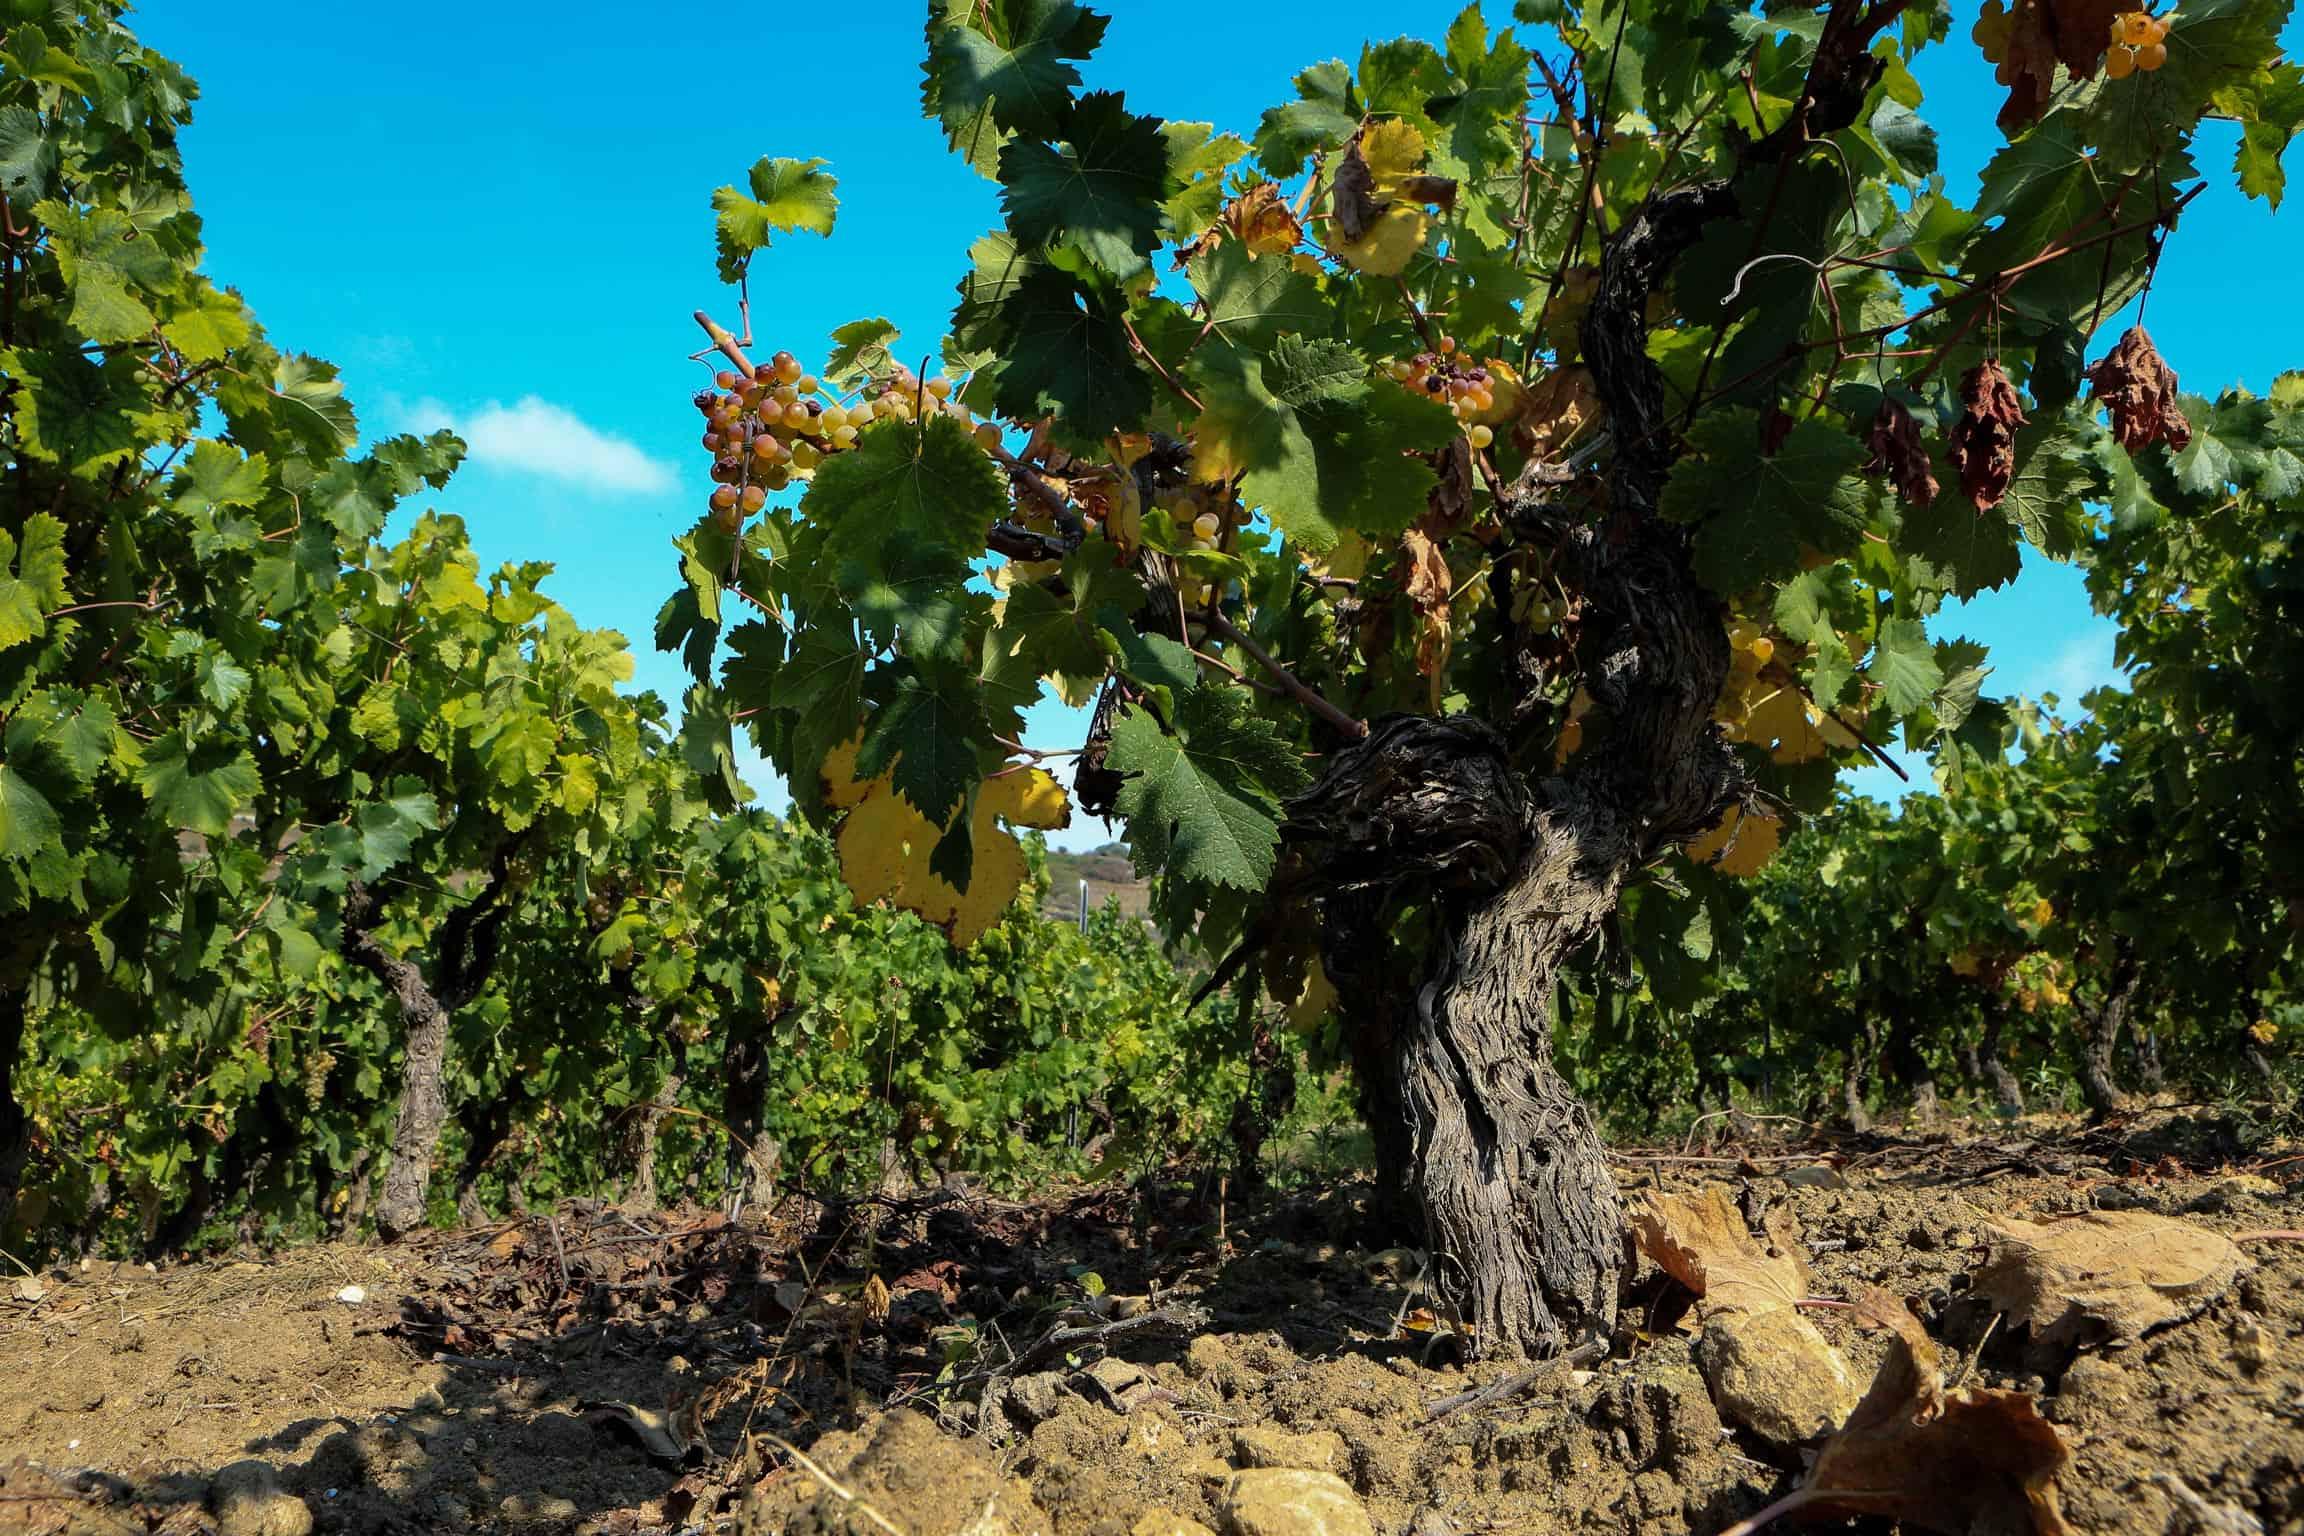 Vigneto uva bianca - Mandrolisai Sardegna